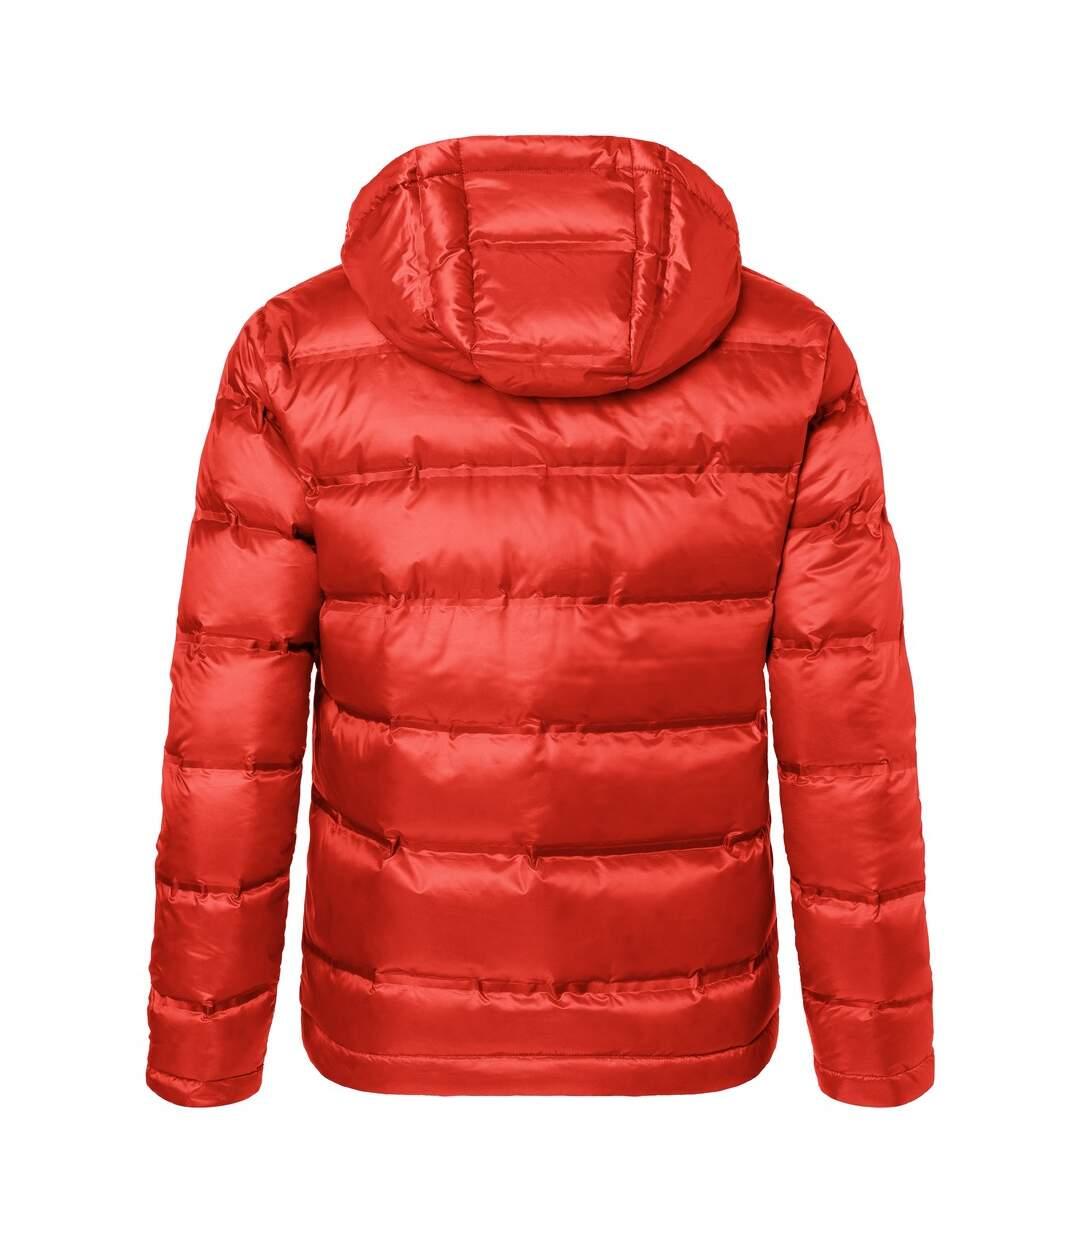 James and Nicholson Mens Hooded Down Jacket (Flame Red/Black) - UTFU378